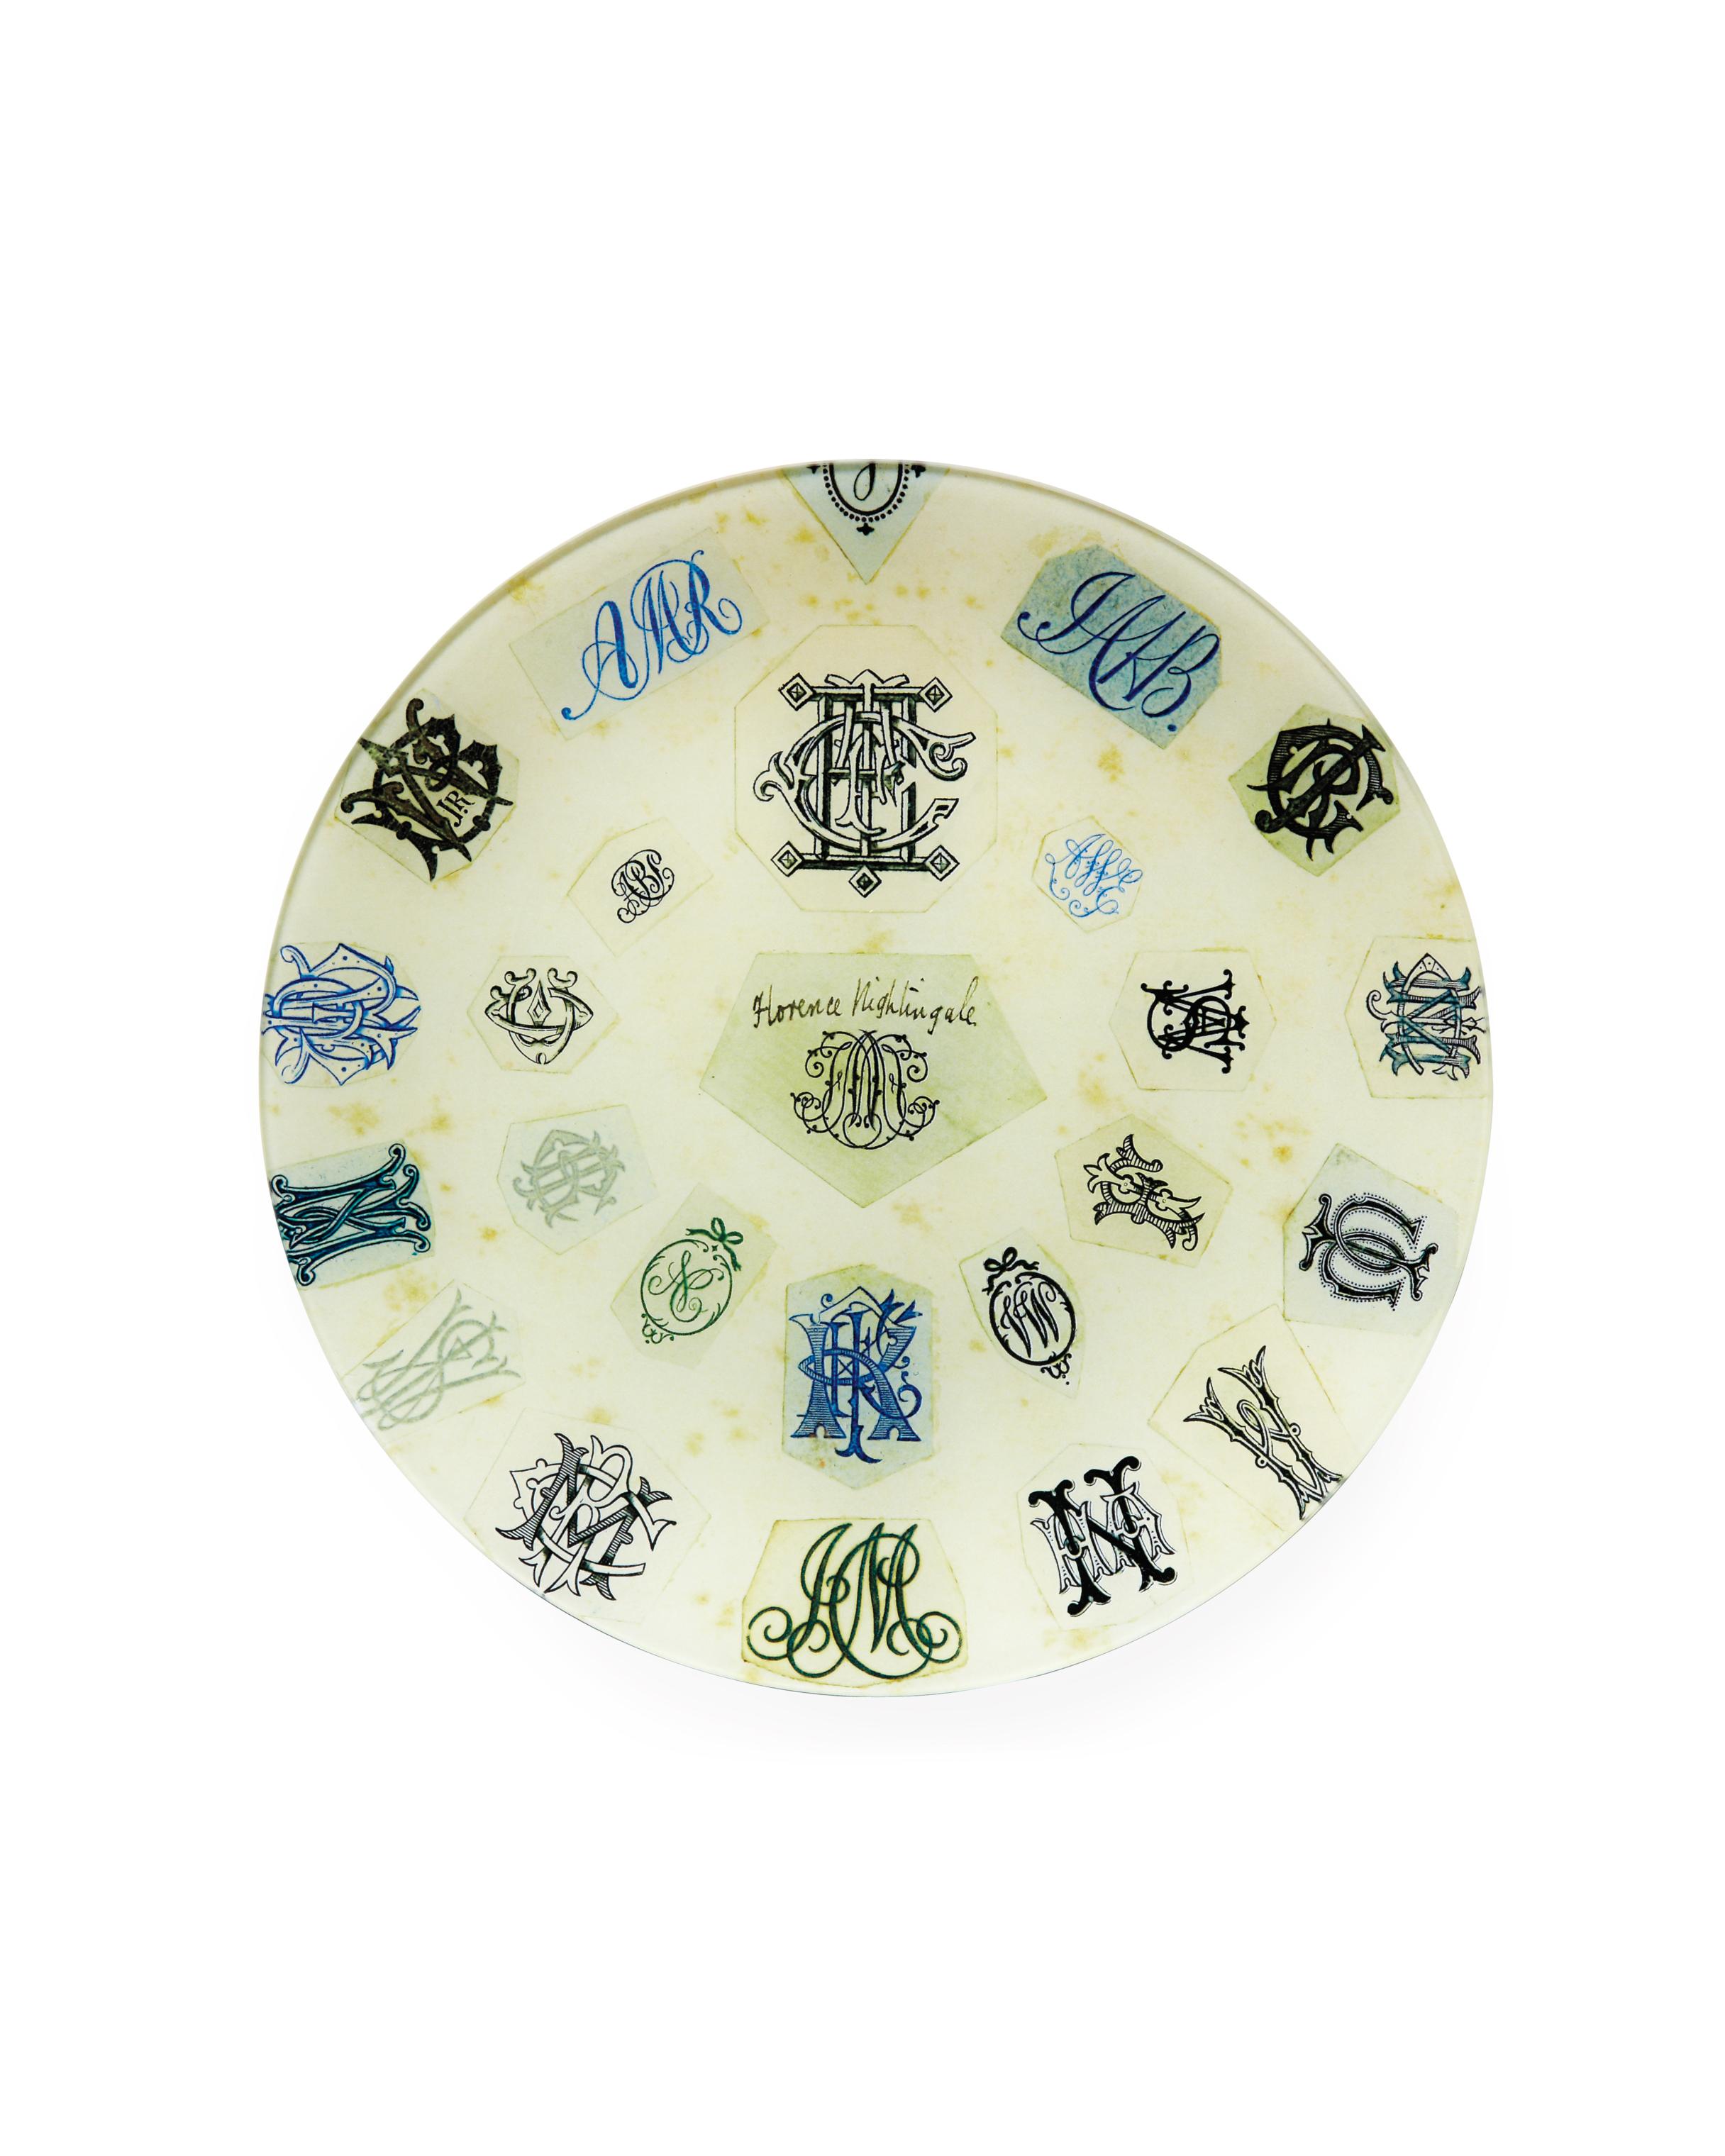 handmade-plate-mwd108533.jpg